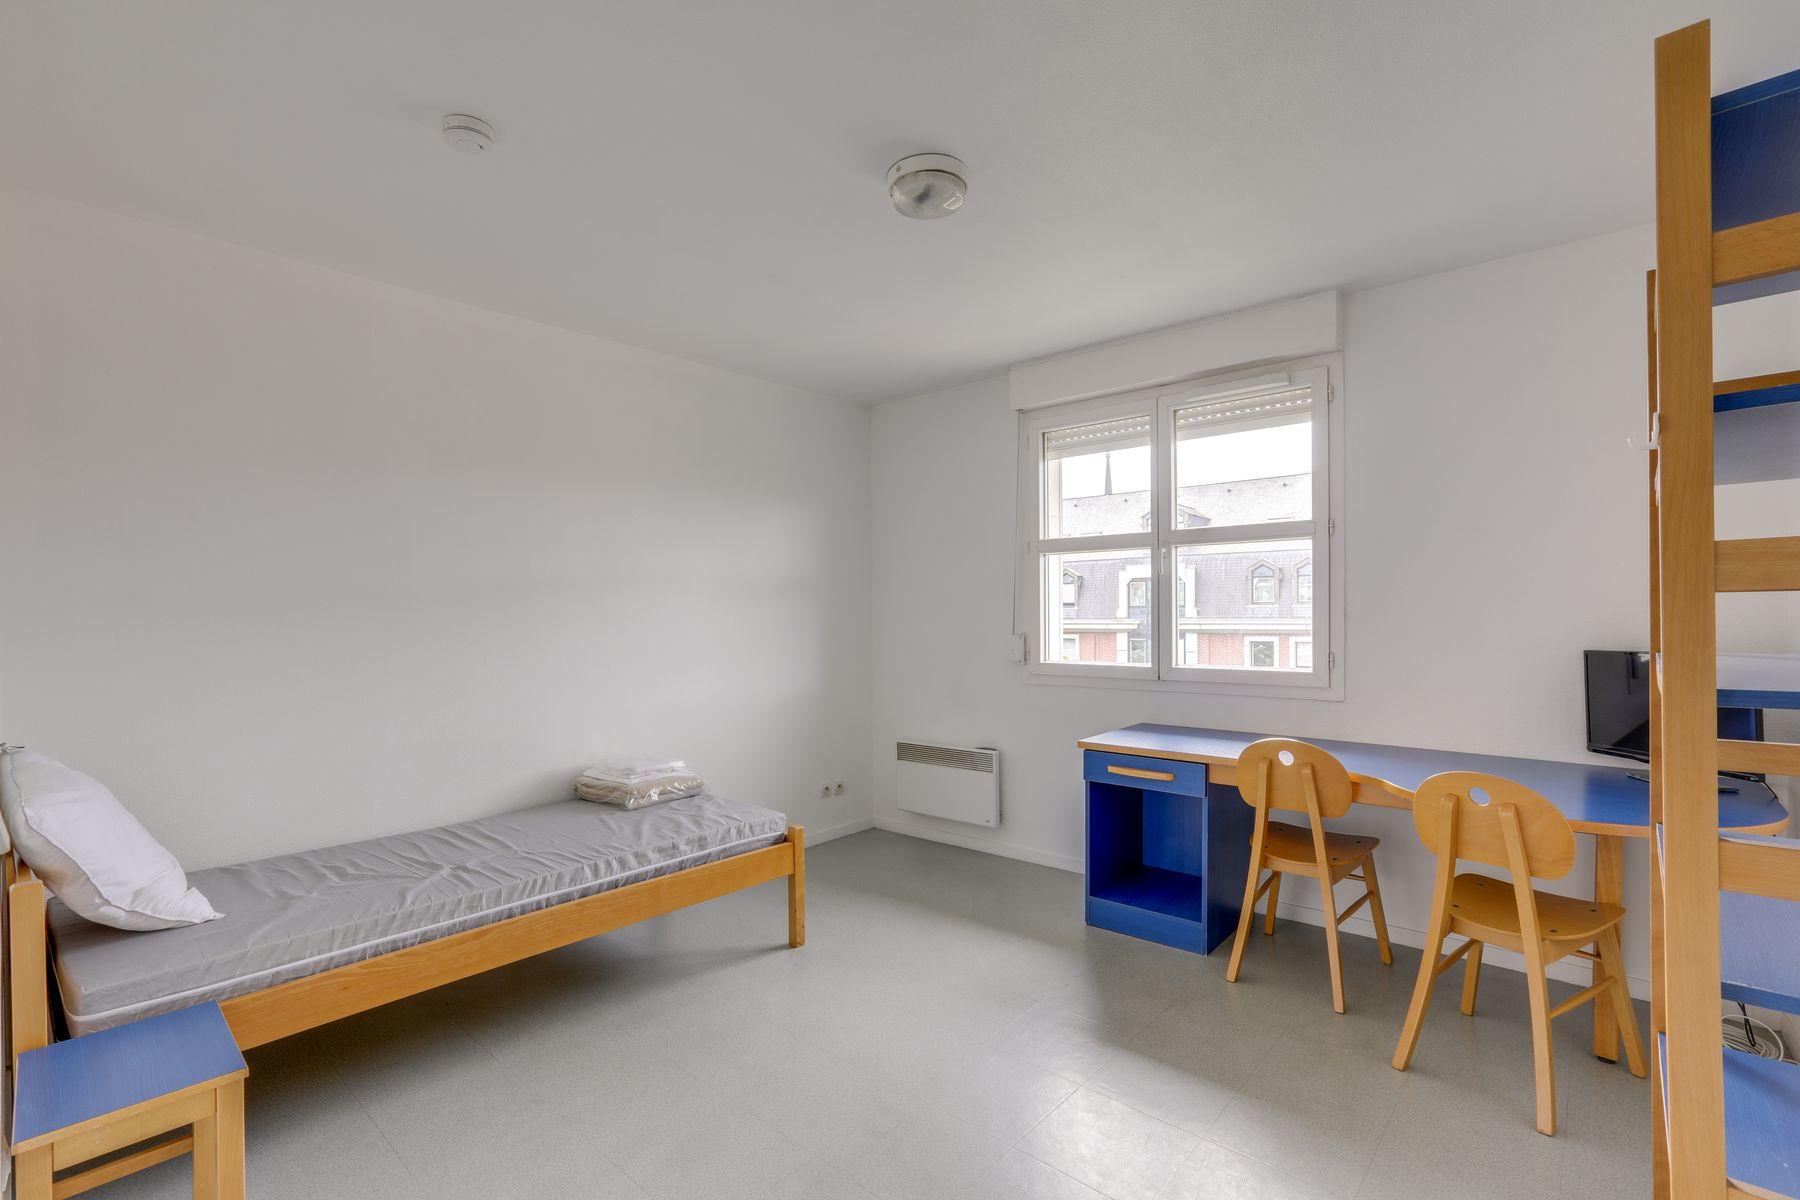 LOGIFAC résidence étudiante Gambetta Rouen appart